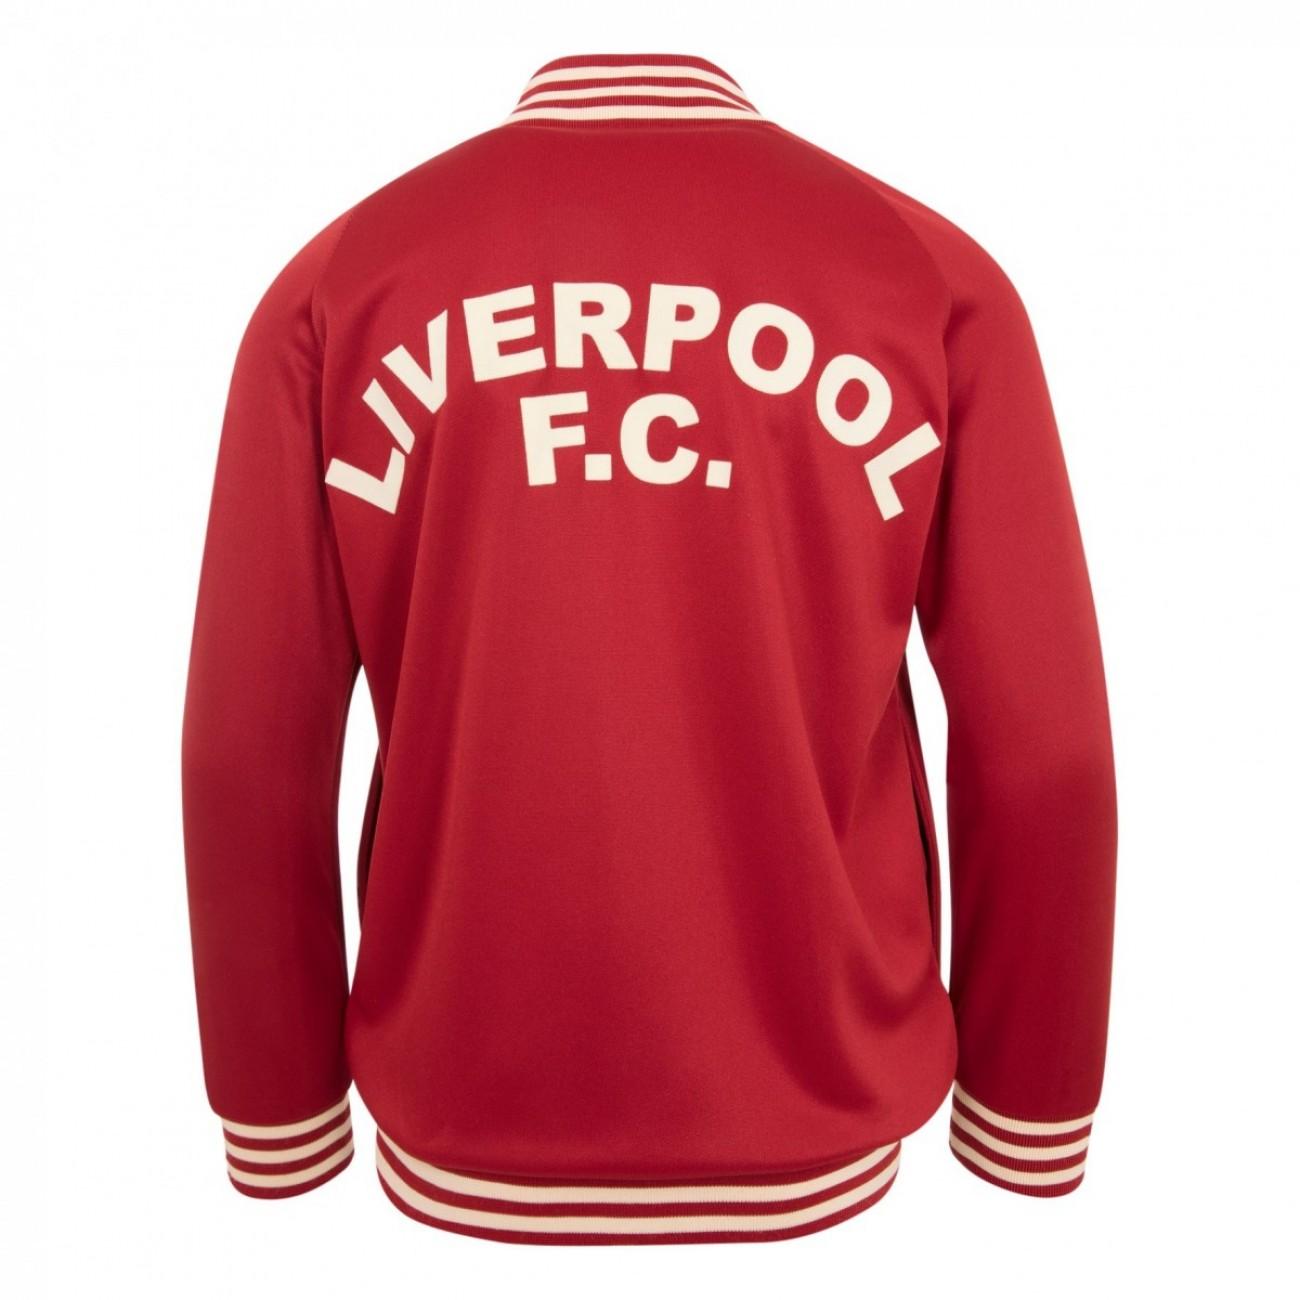 Chaqueta Retro Liverpool  665582c5d5ff2